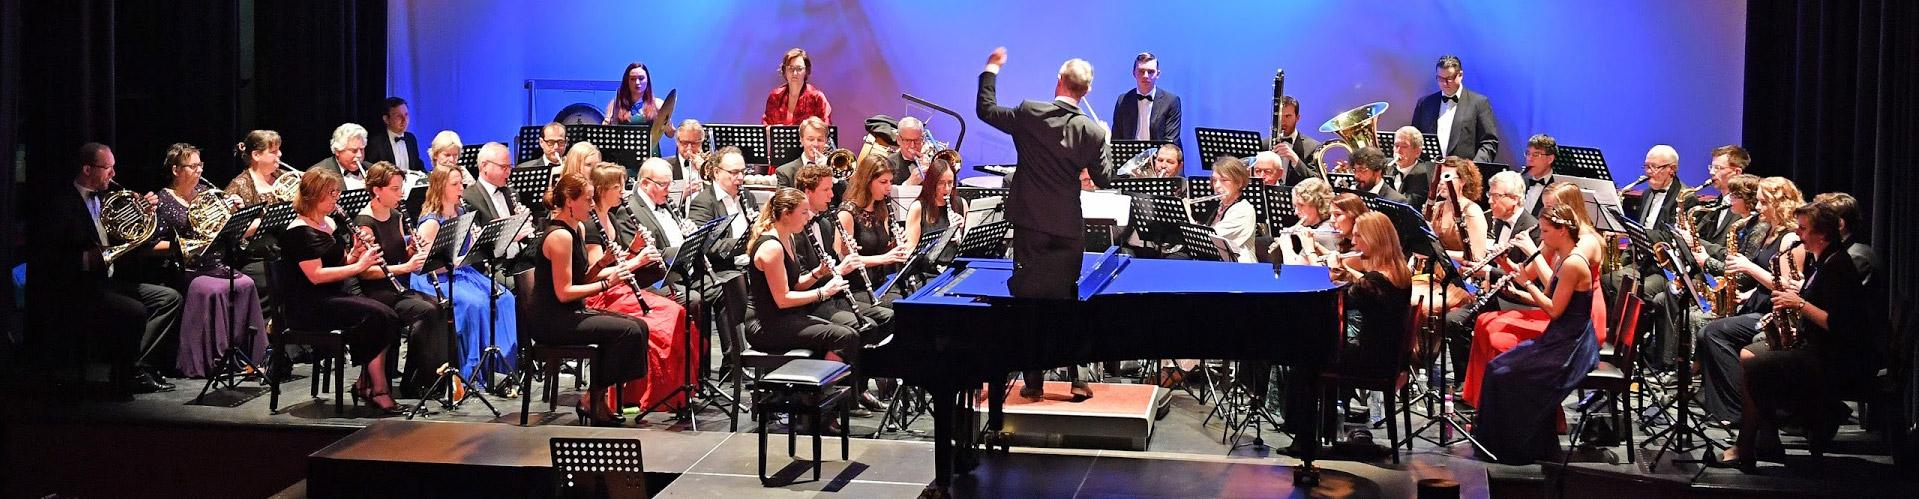 Muziekvereniging Excelsior Wassenaar